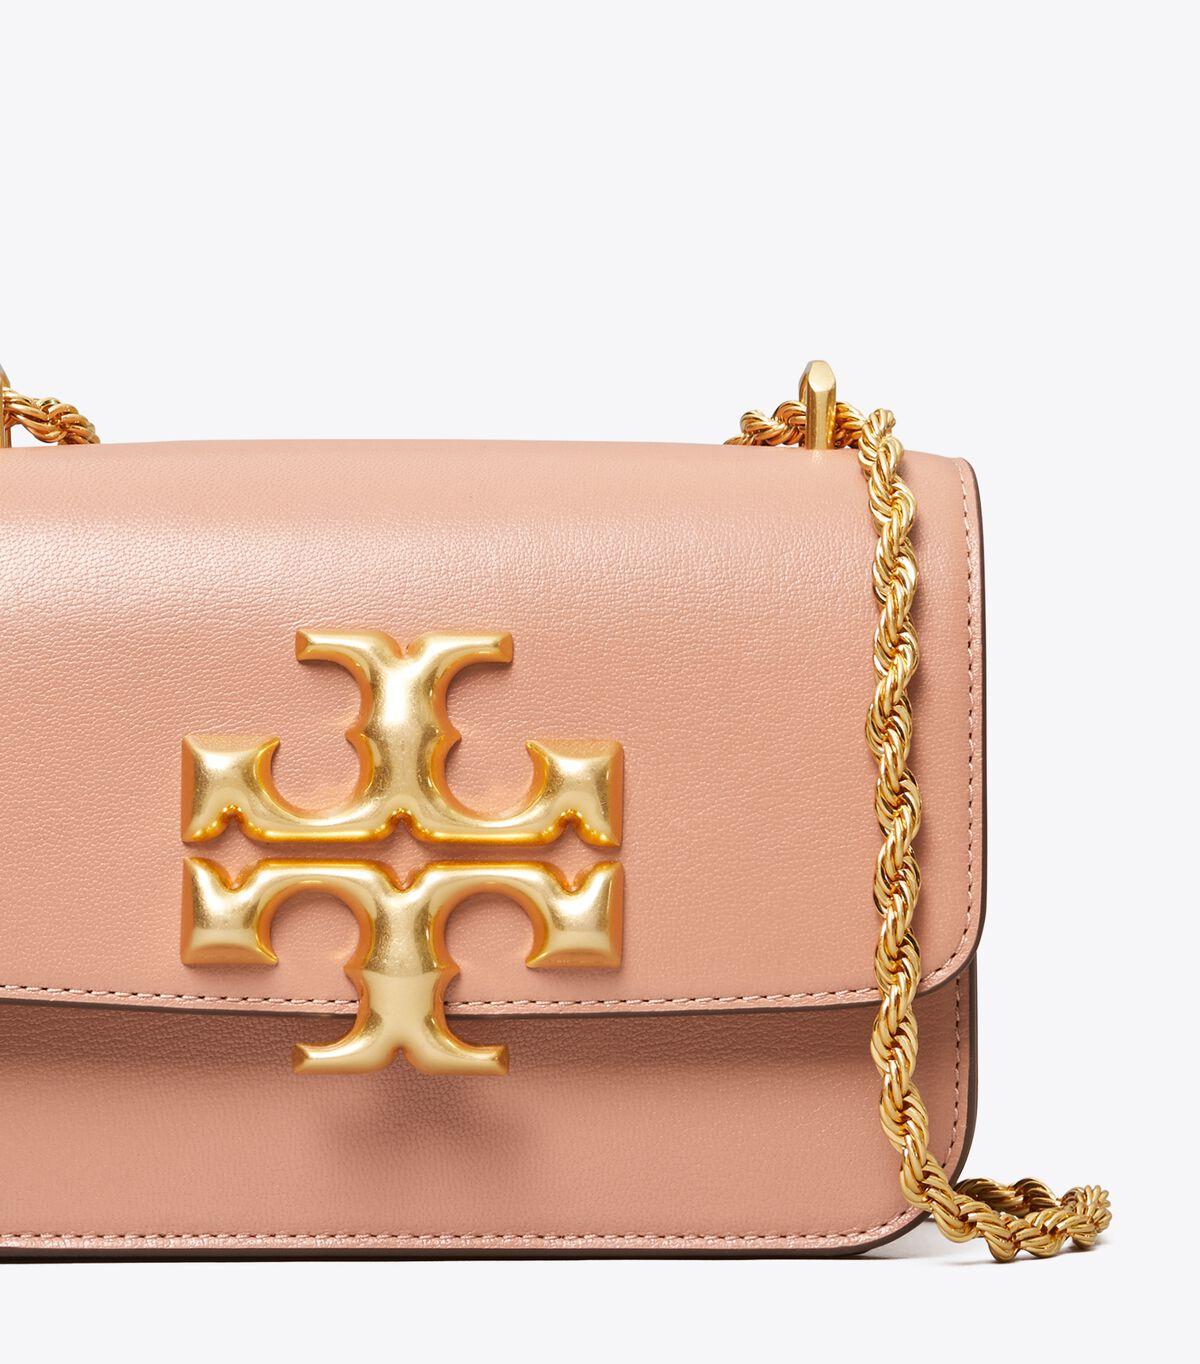 Eleanor Small Bag